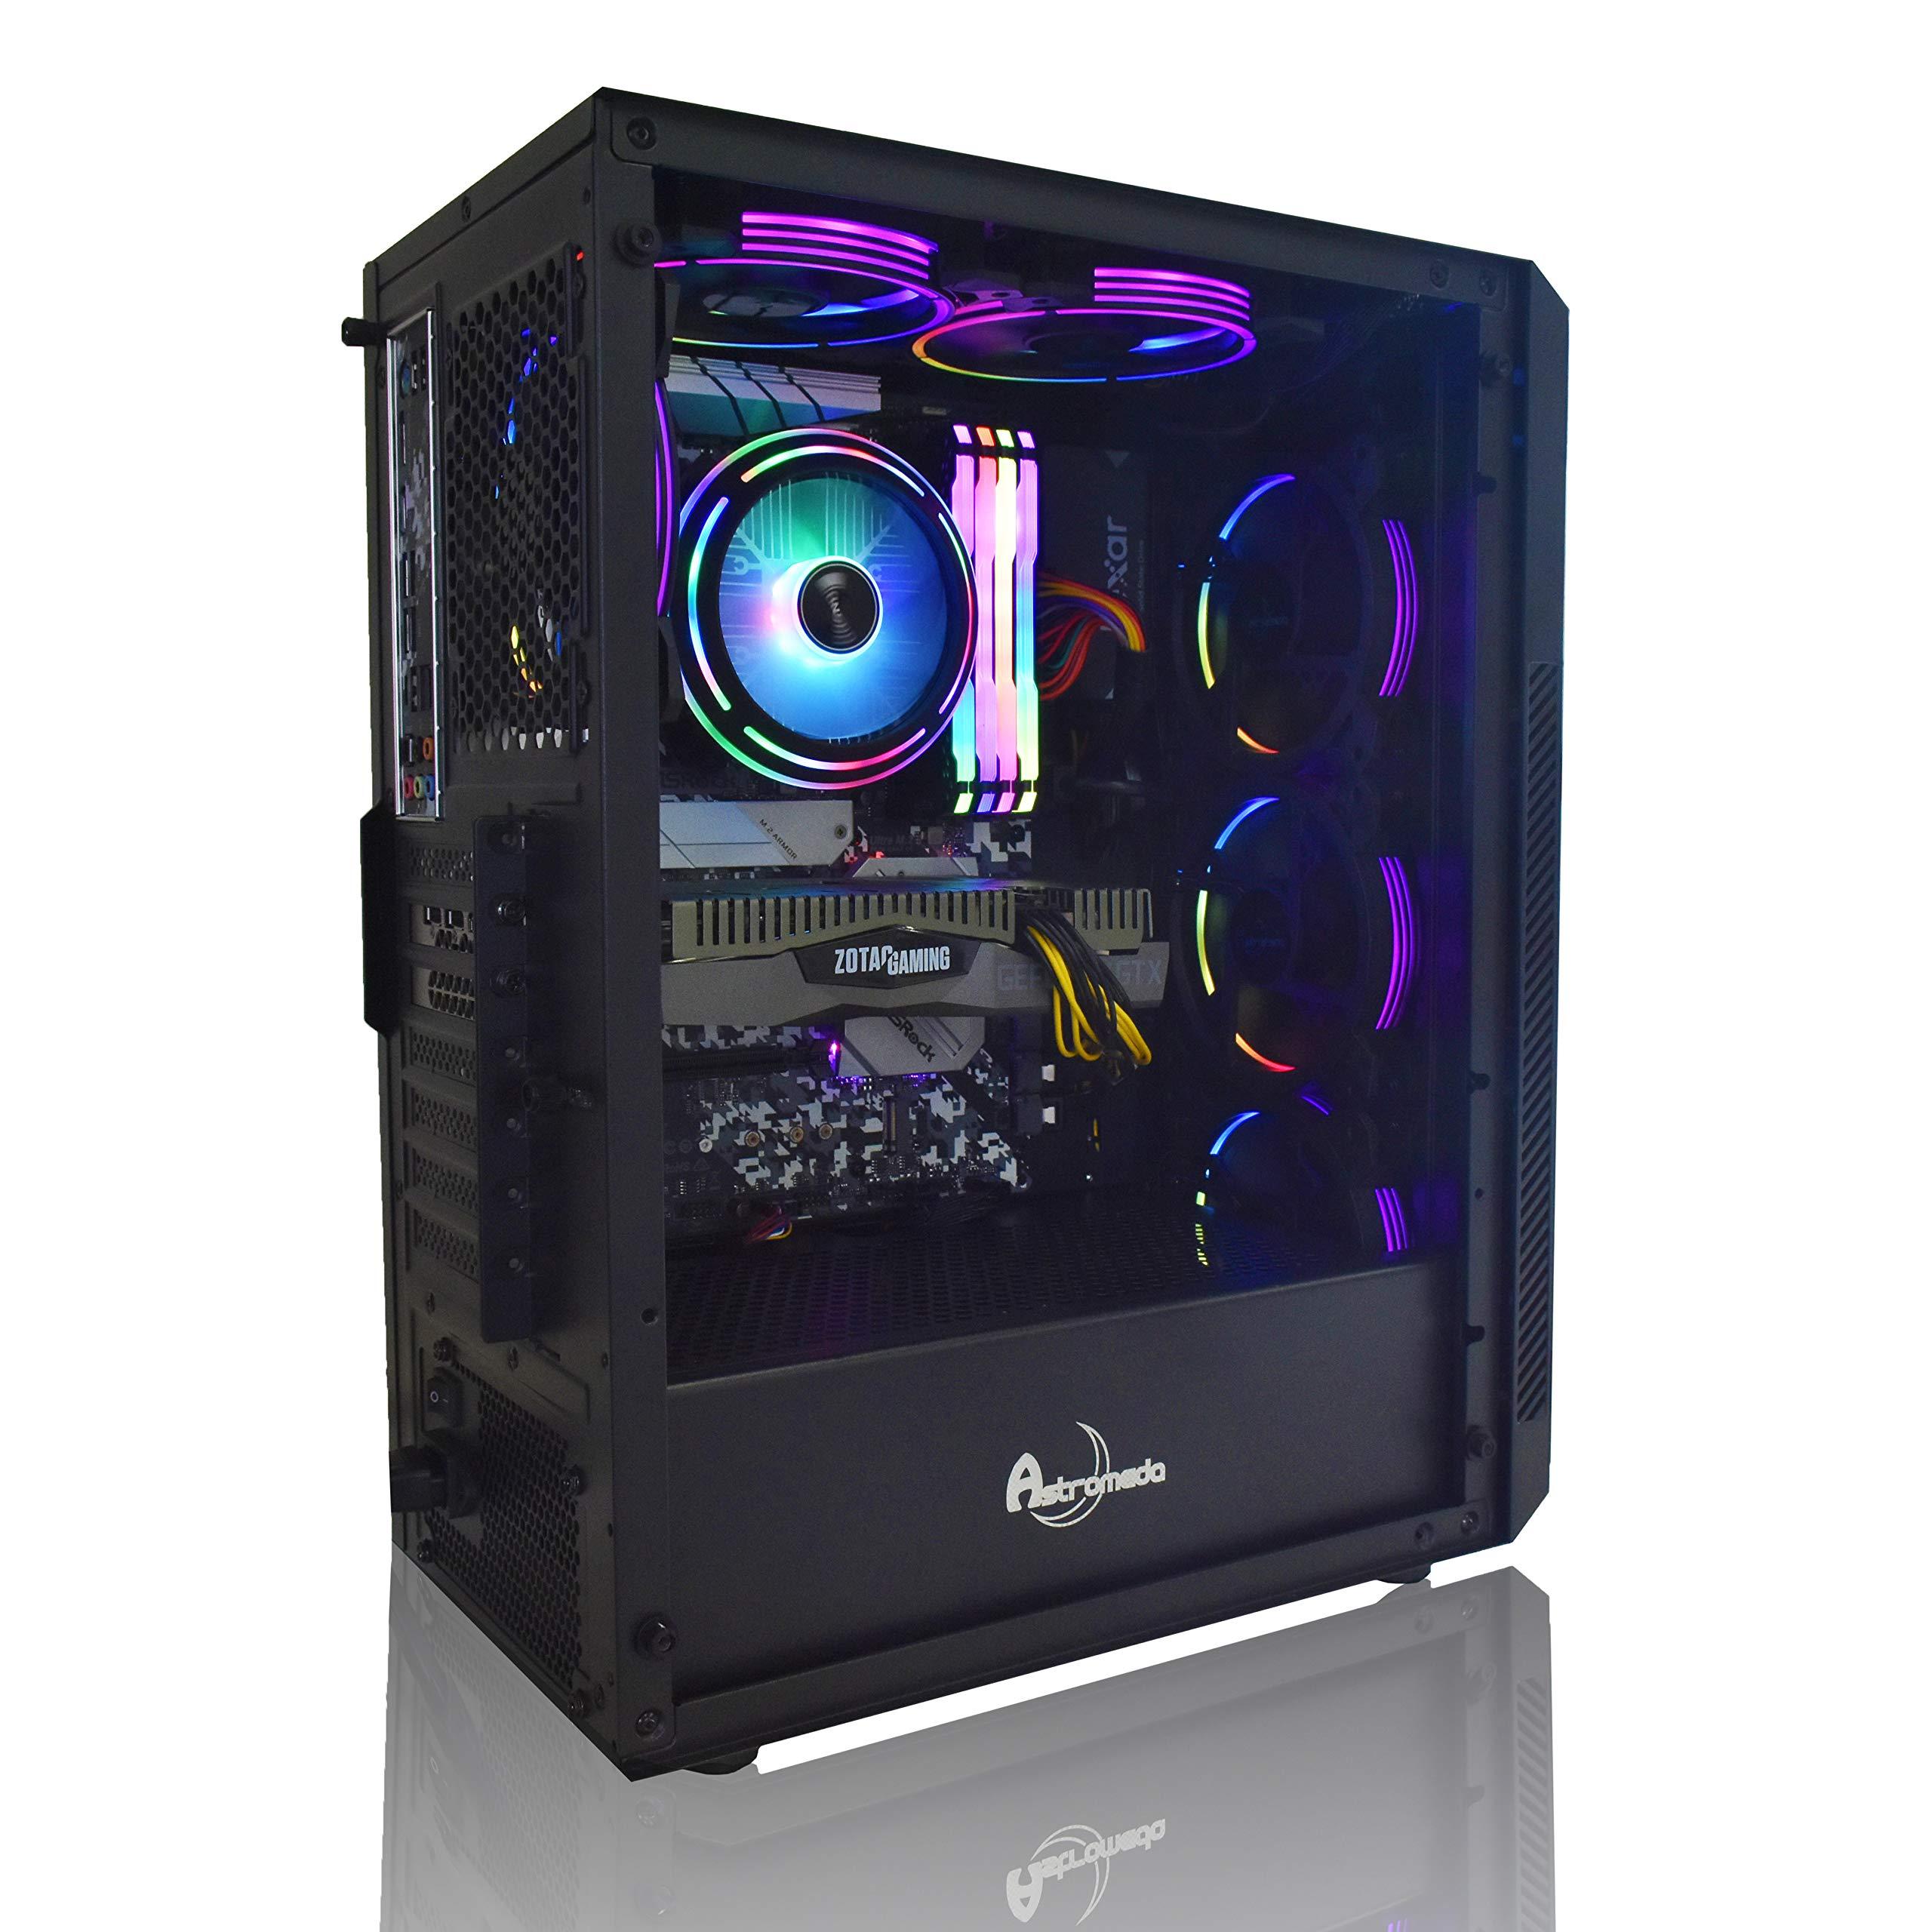 ASTROMEDA SIRIUS 年末特選モデル【Ryzen5-3500X/Geforce-GTX1660/RGBメモリ16GB/SSD240GB/HDD2TB/Widows10Home 64bit/600W/黒ケース】ゲーミングデスクトップパソコンv000